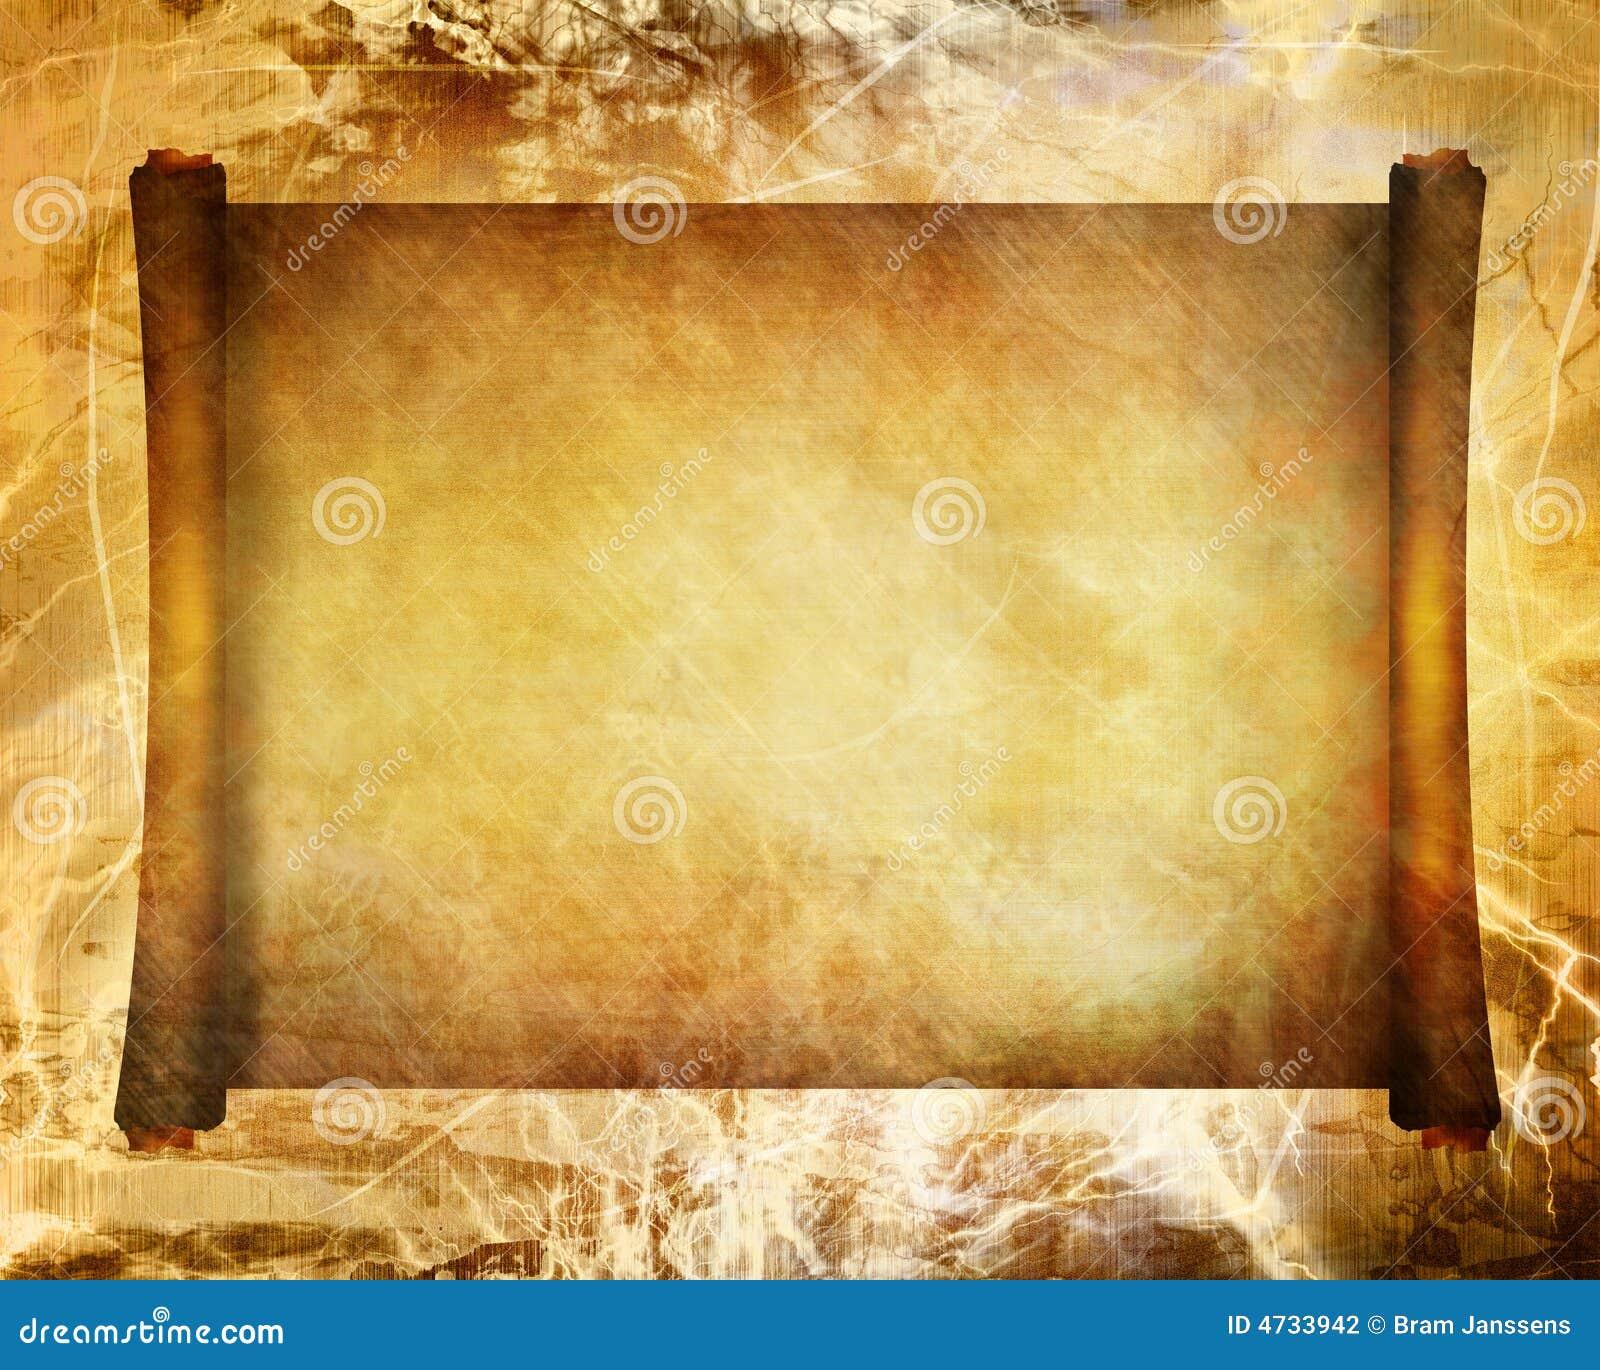 ancient scrolls background wwwpixsharkcom images